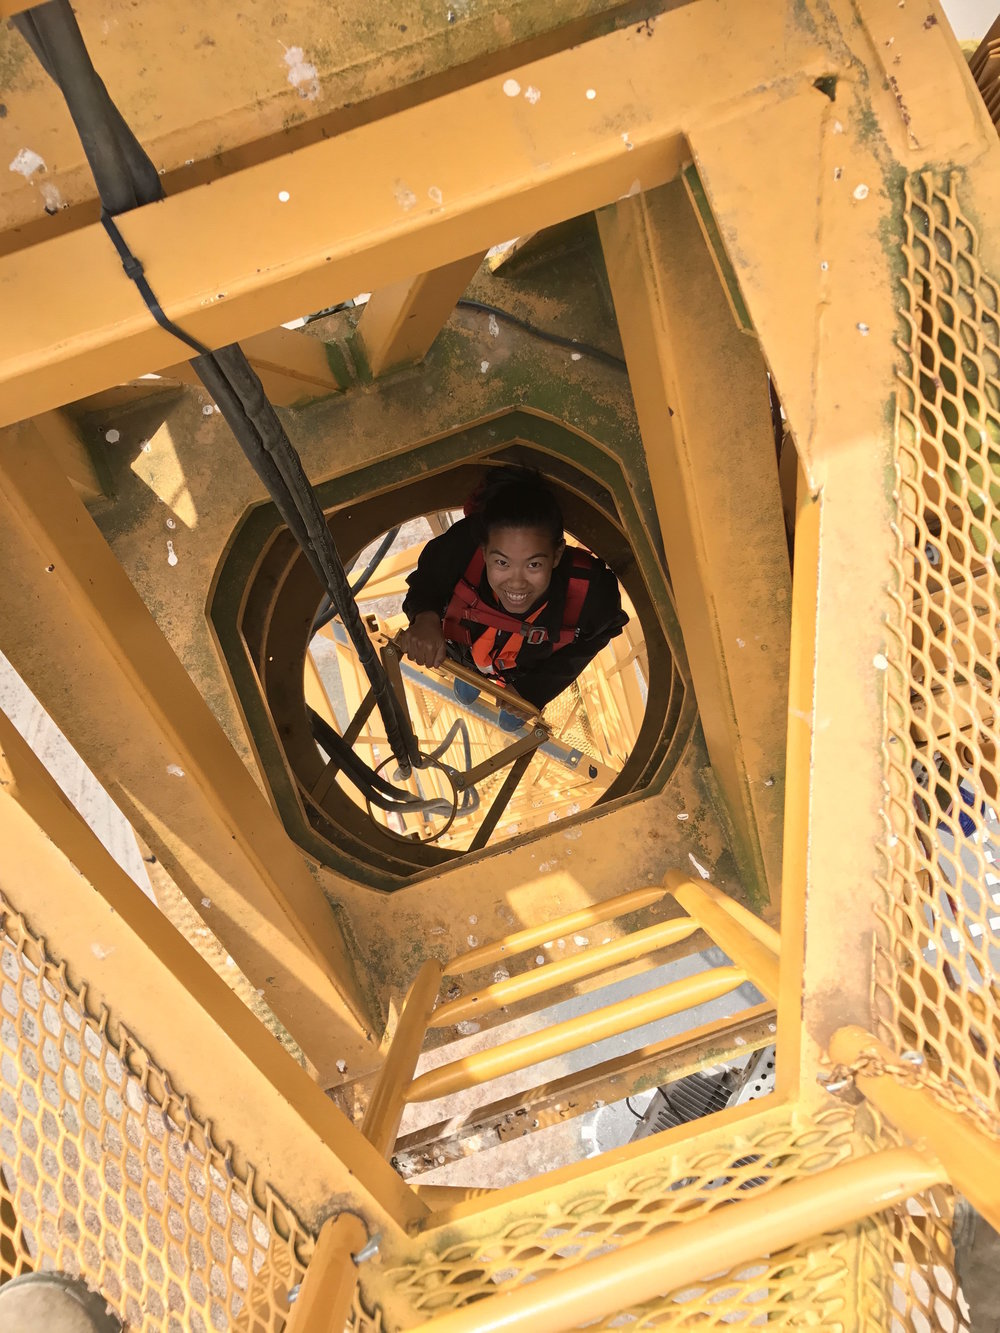 That's me climbing the 100-foot crane.